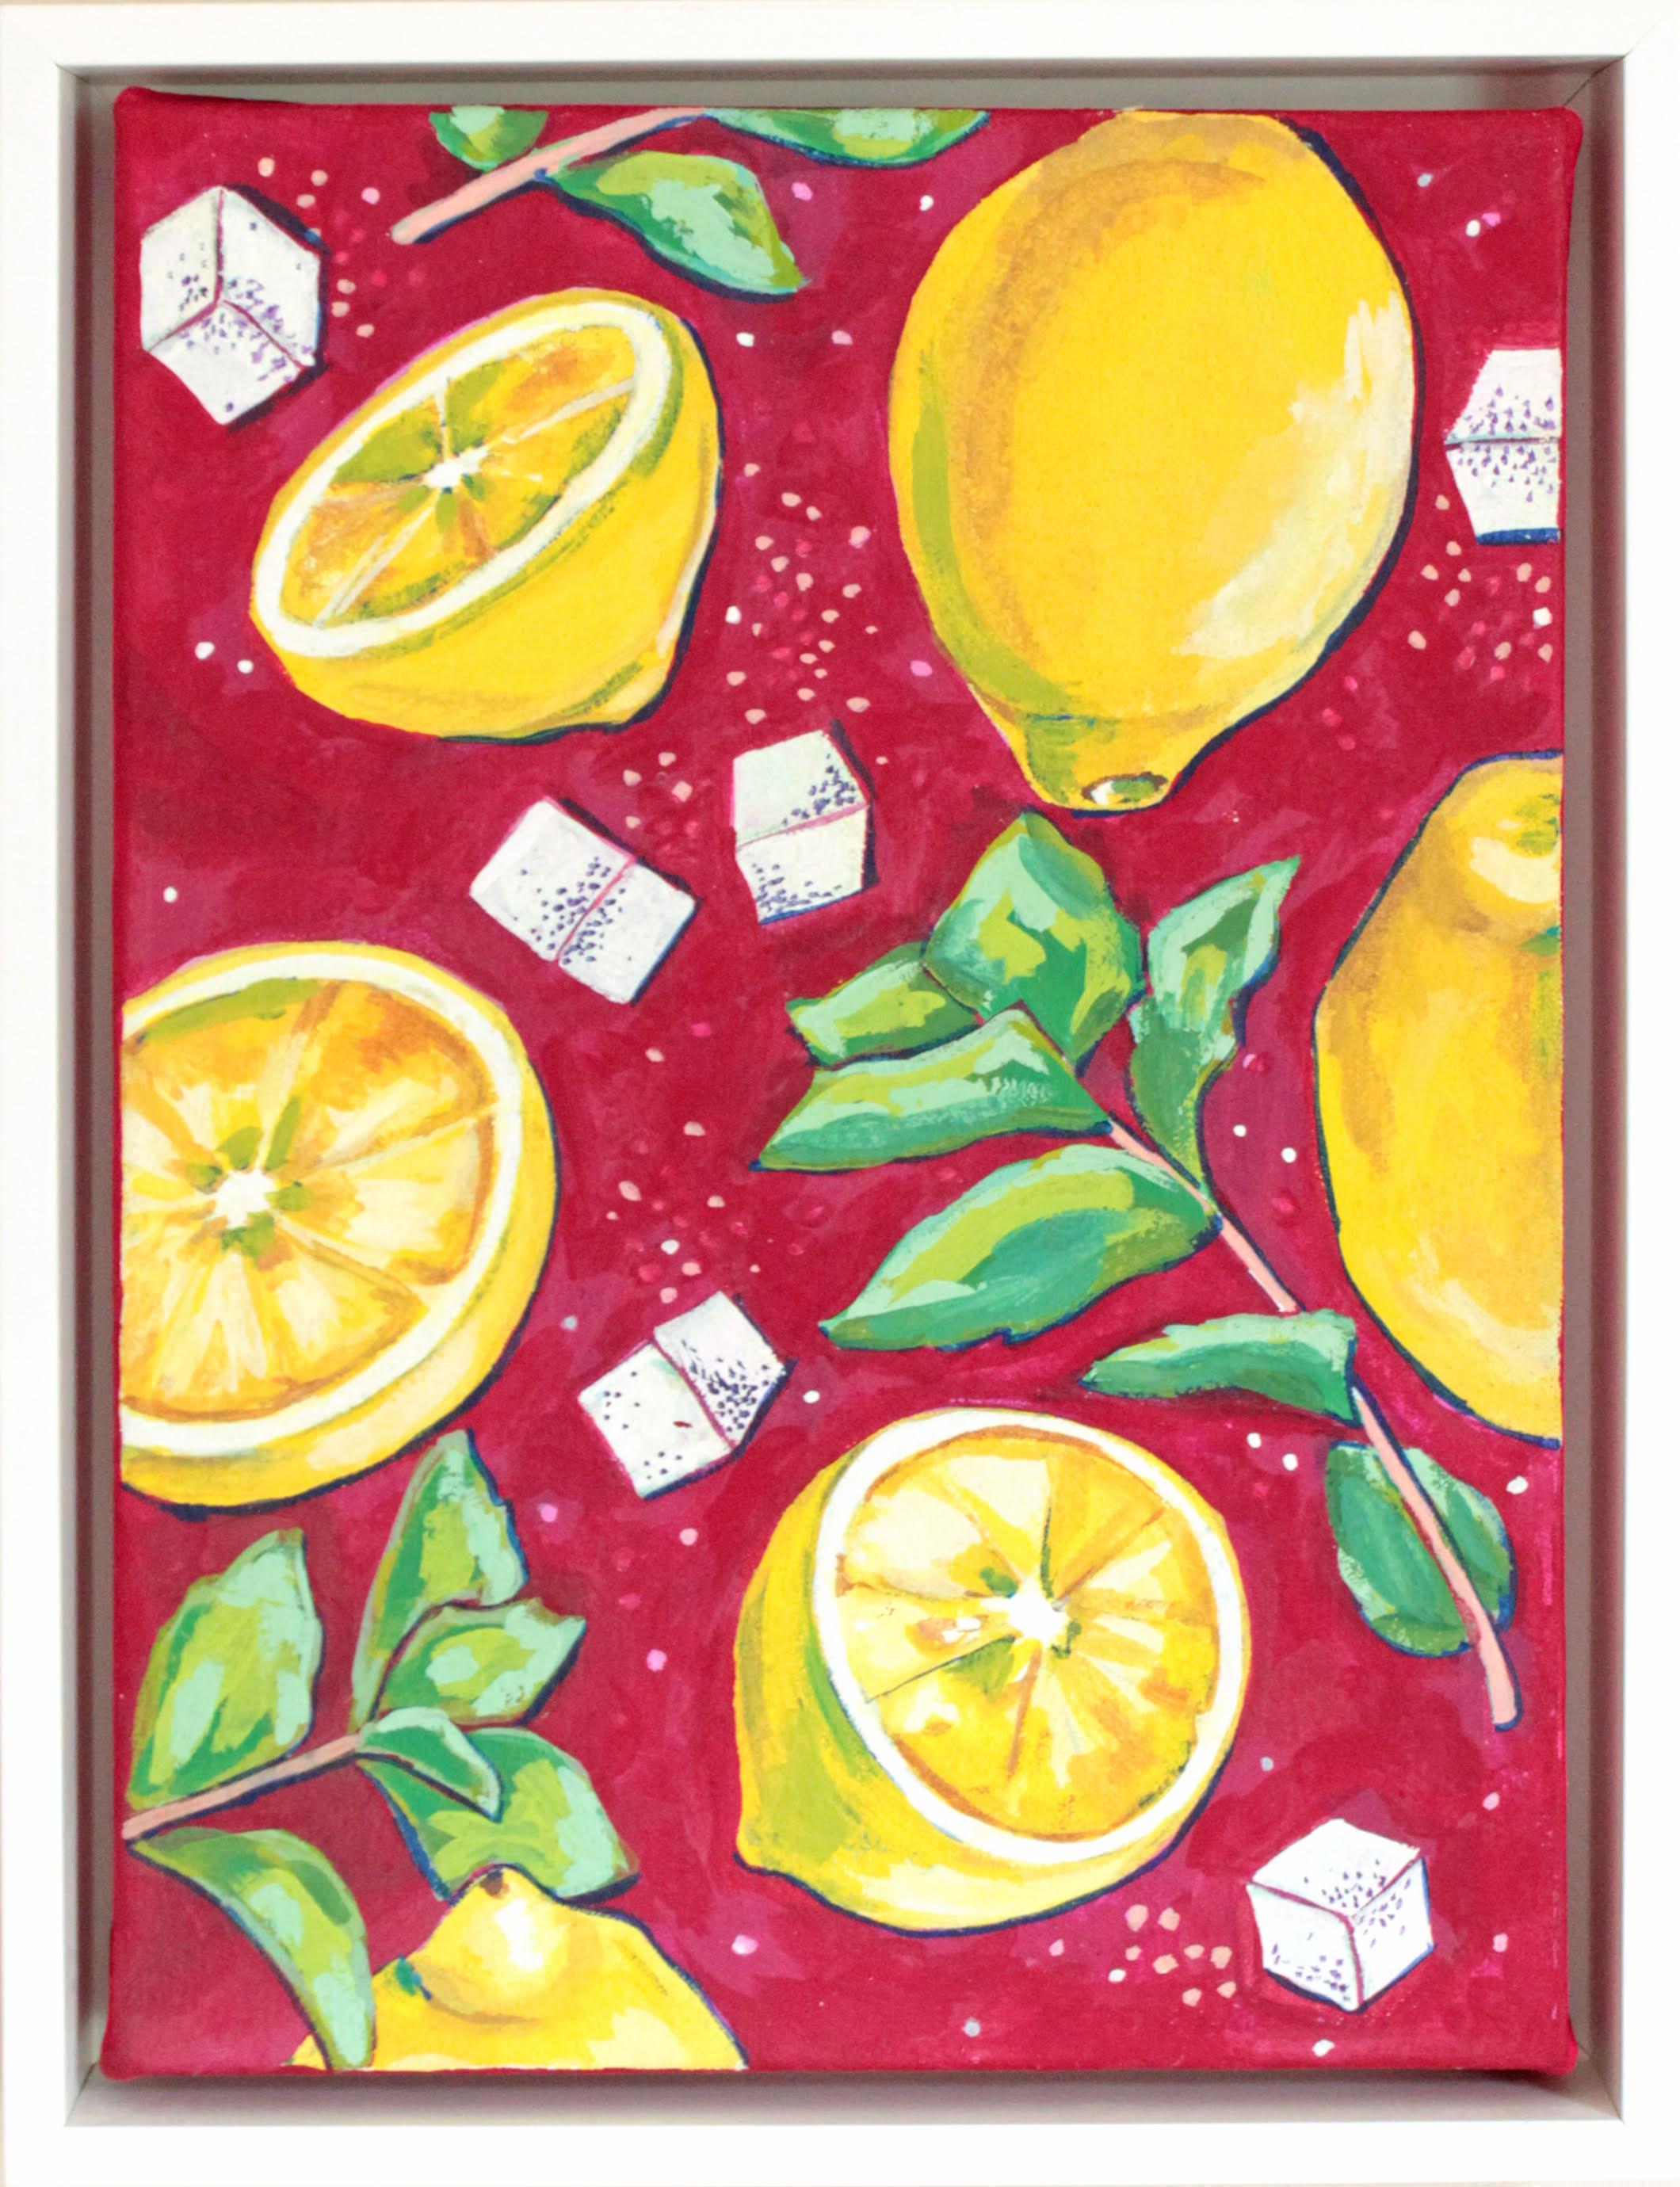 When Life Gives You Lemons - 13.5